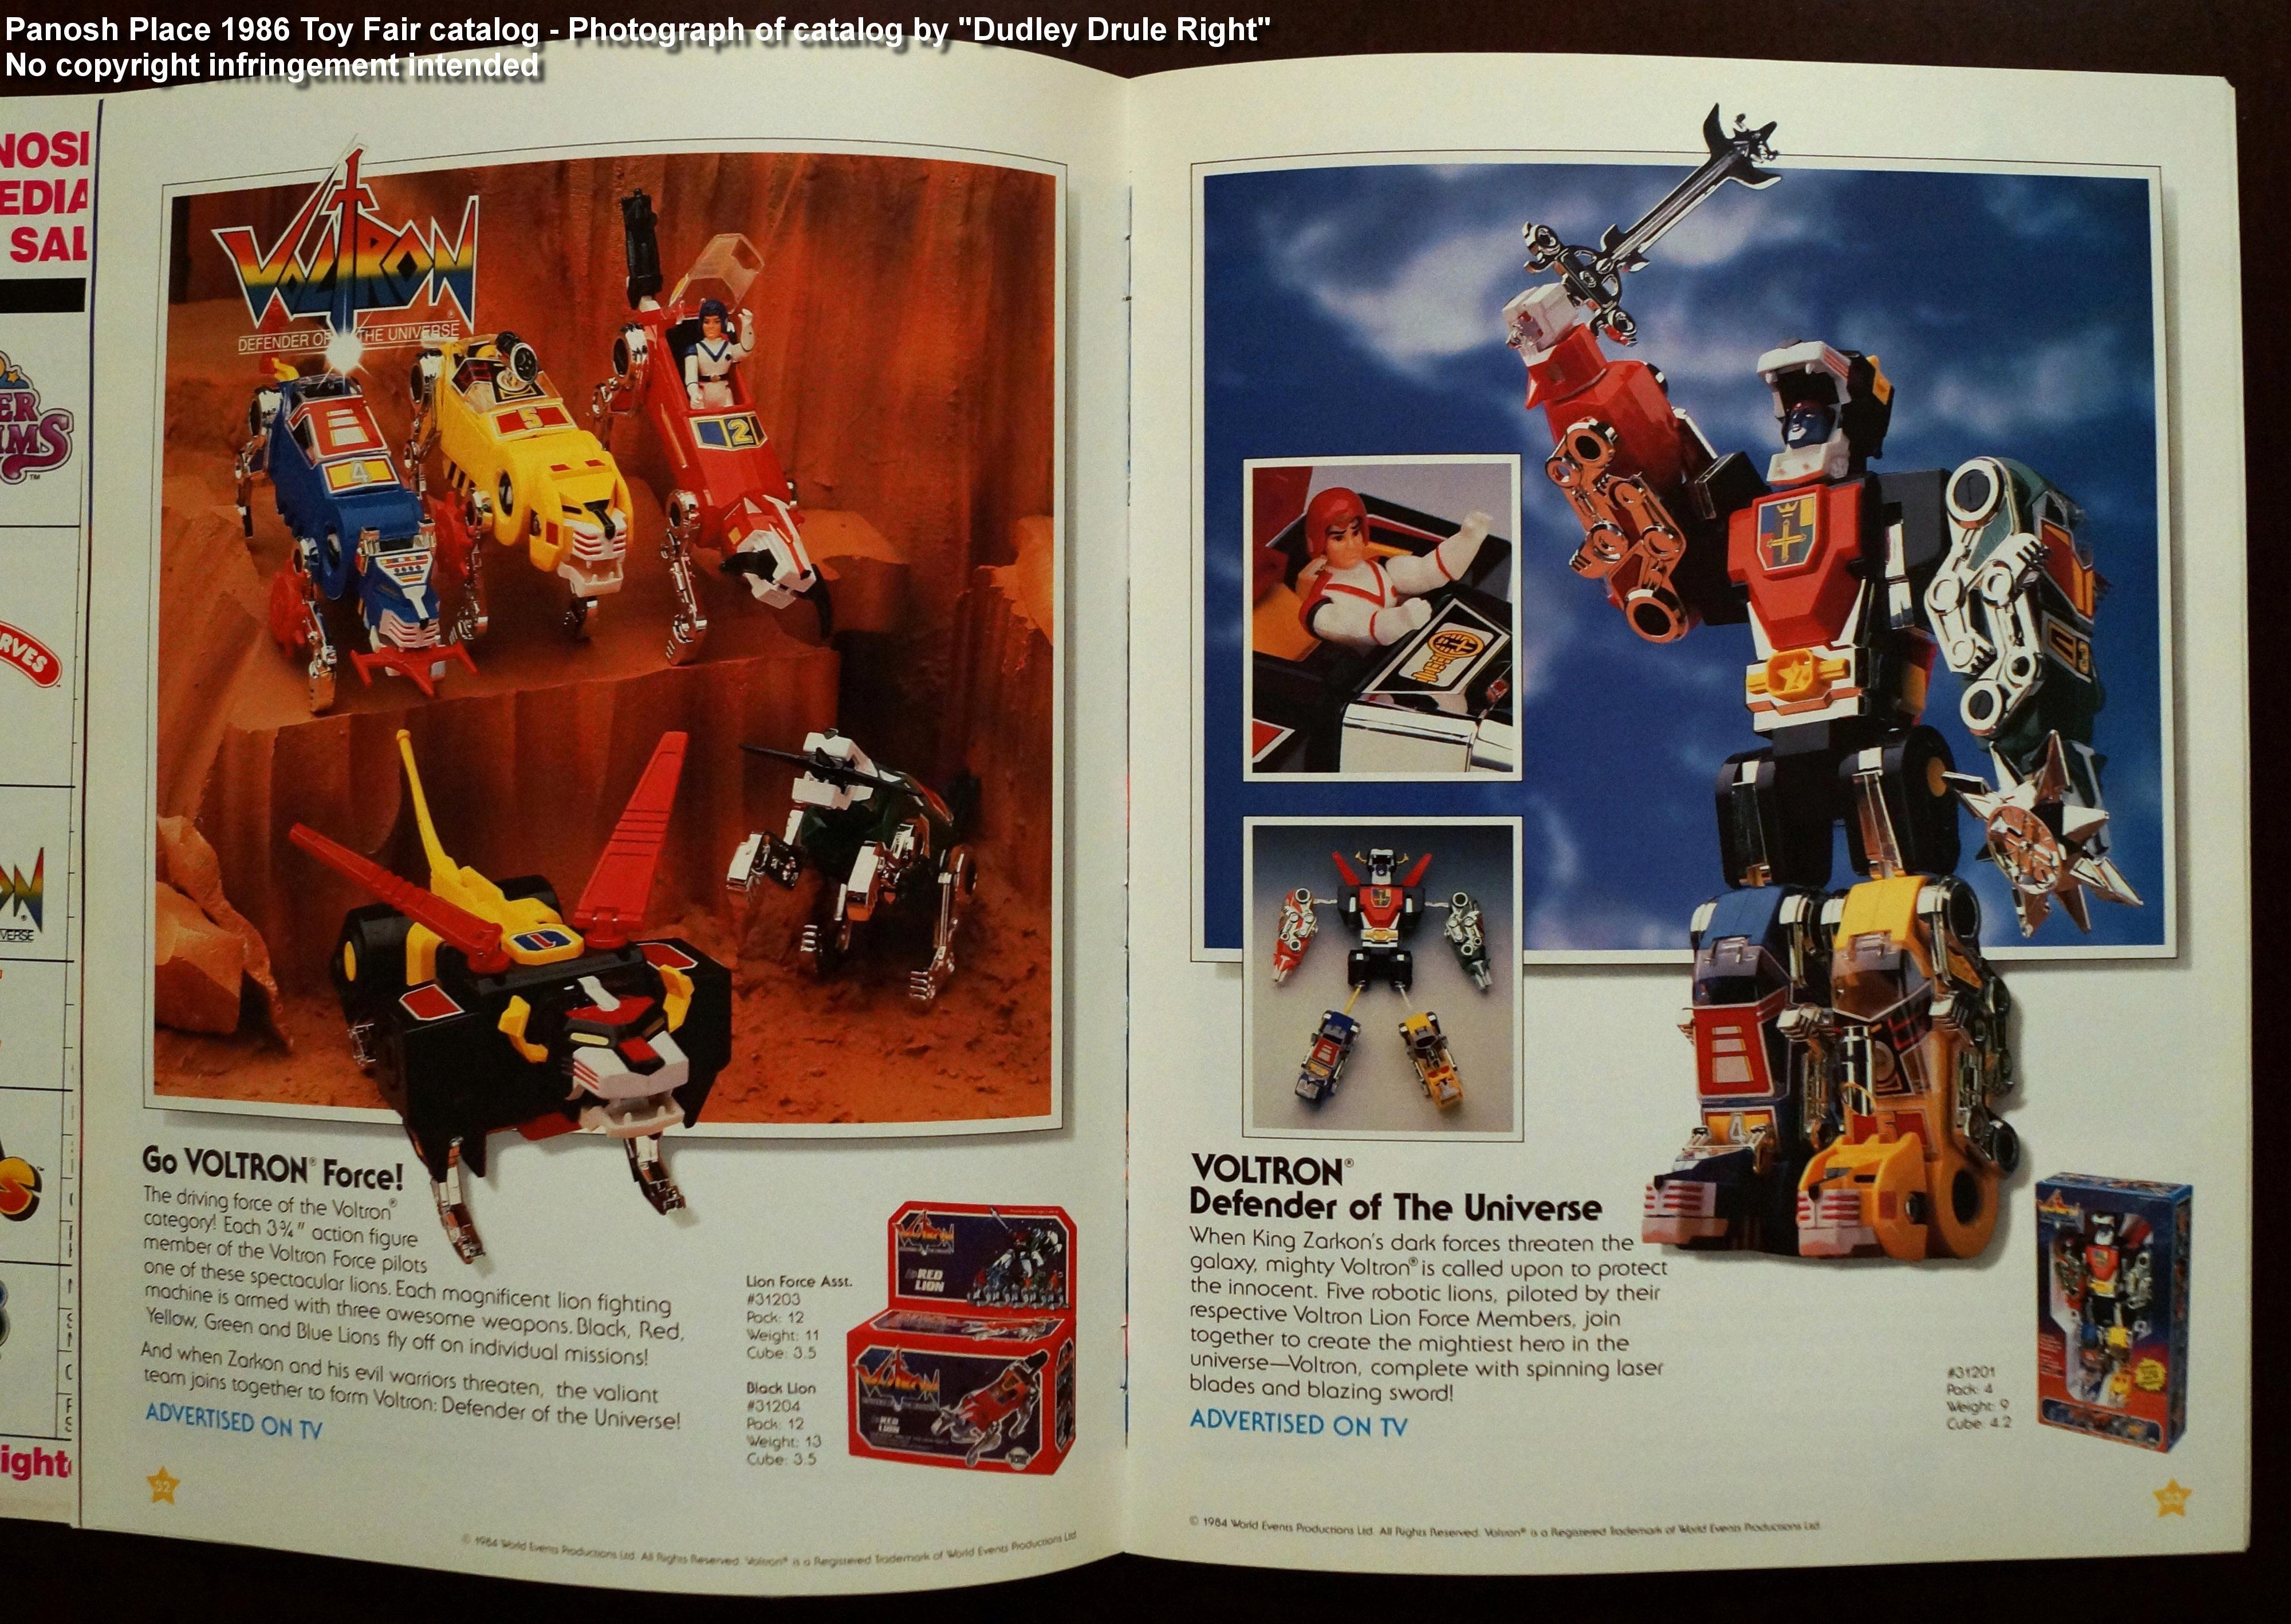 Panosh Place 1986 Toy Fair Catalog - Pages 32 and 33 (Voltron Lion Force, Voltron Defender of the Universe)